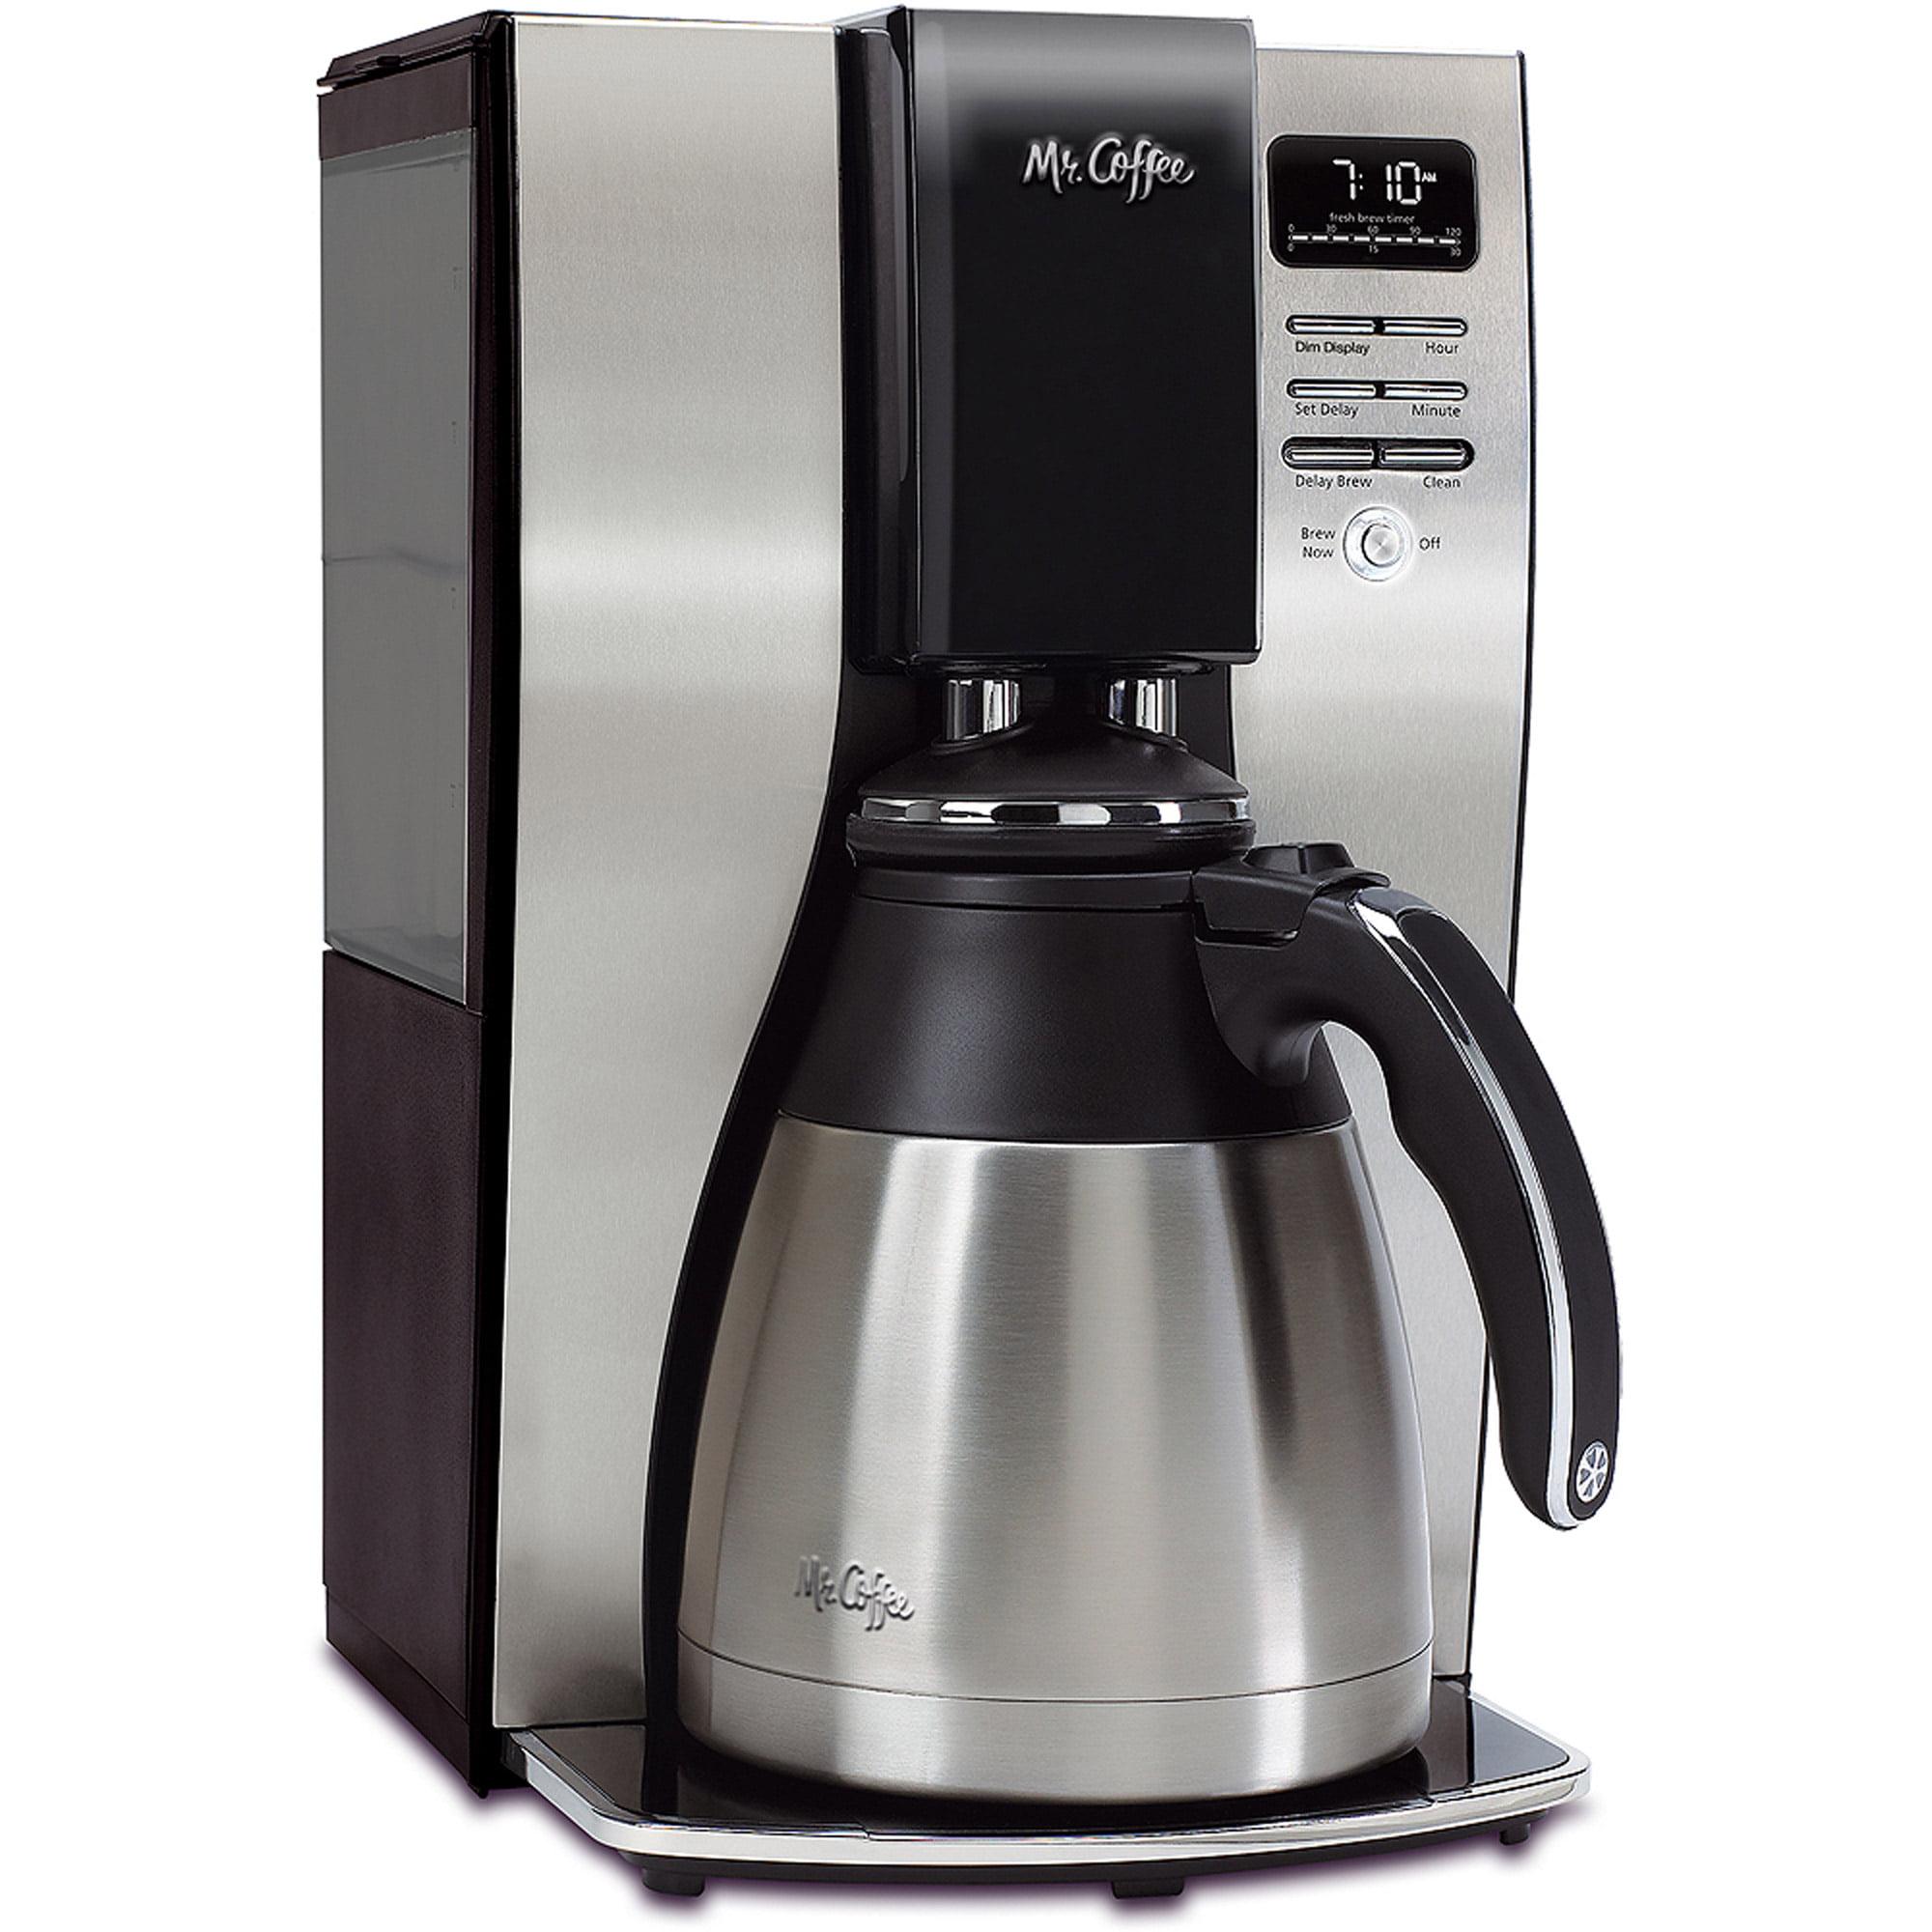 Mr. Coffee 10-Cup OptimalBrew Thermal Coffee Maker, BVMC-PSTX91-WM